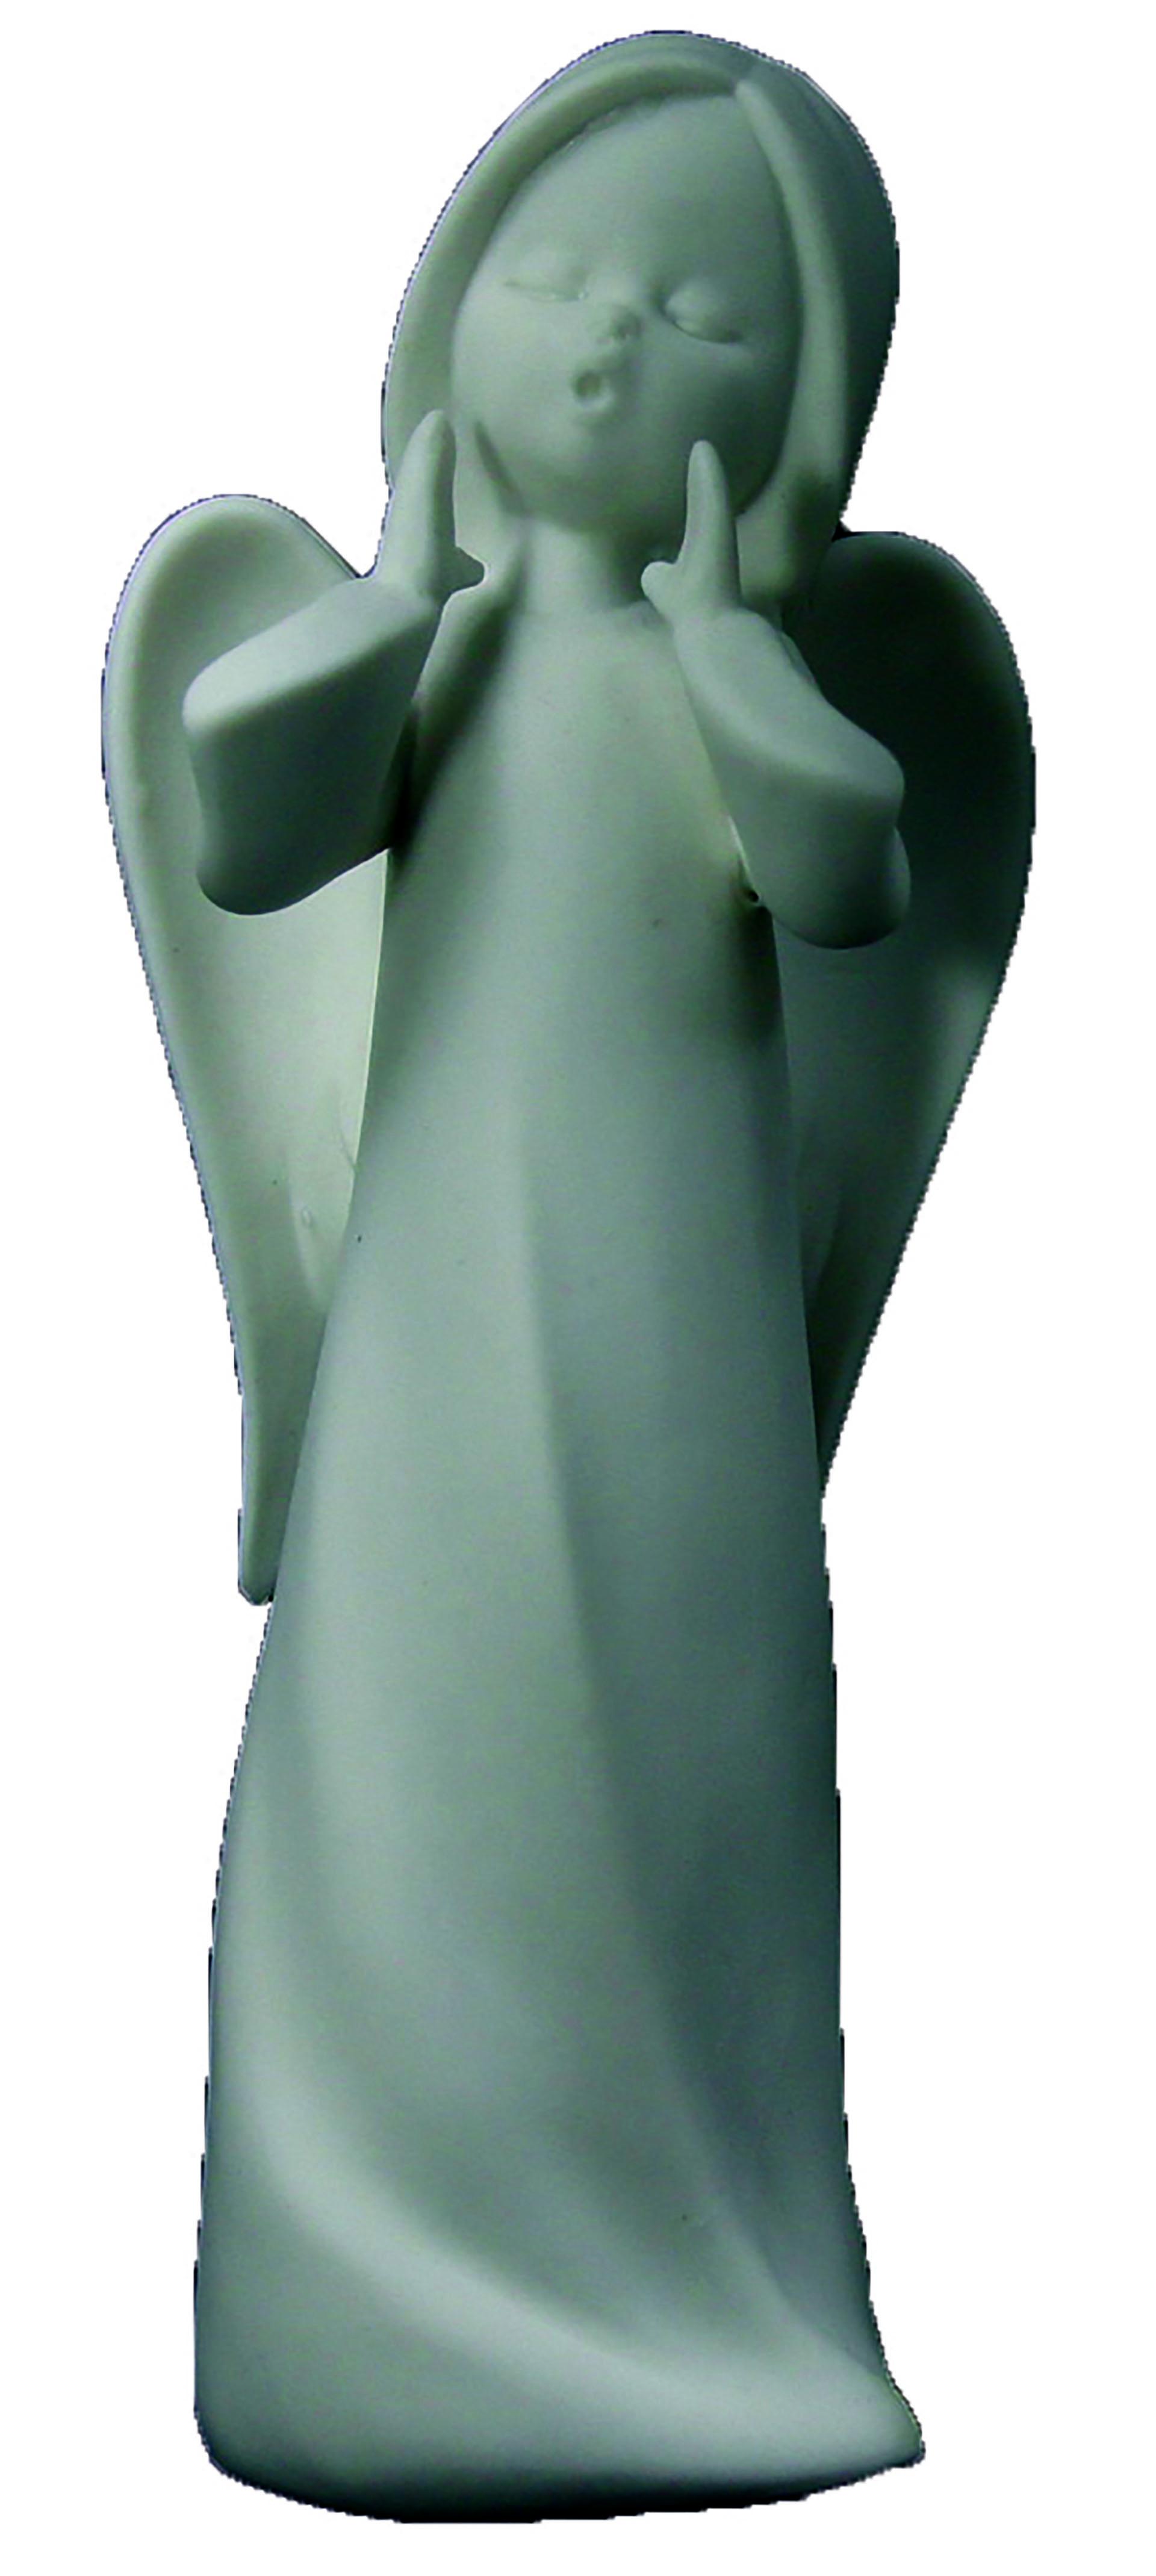 Engel M singend, Höhe 16,5cm